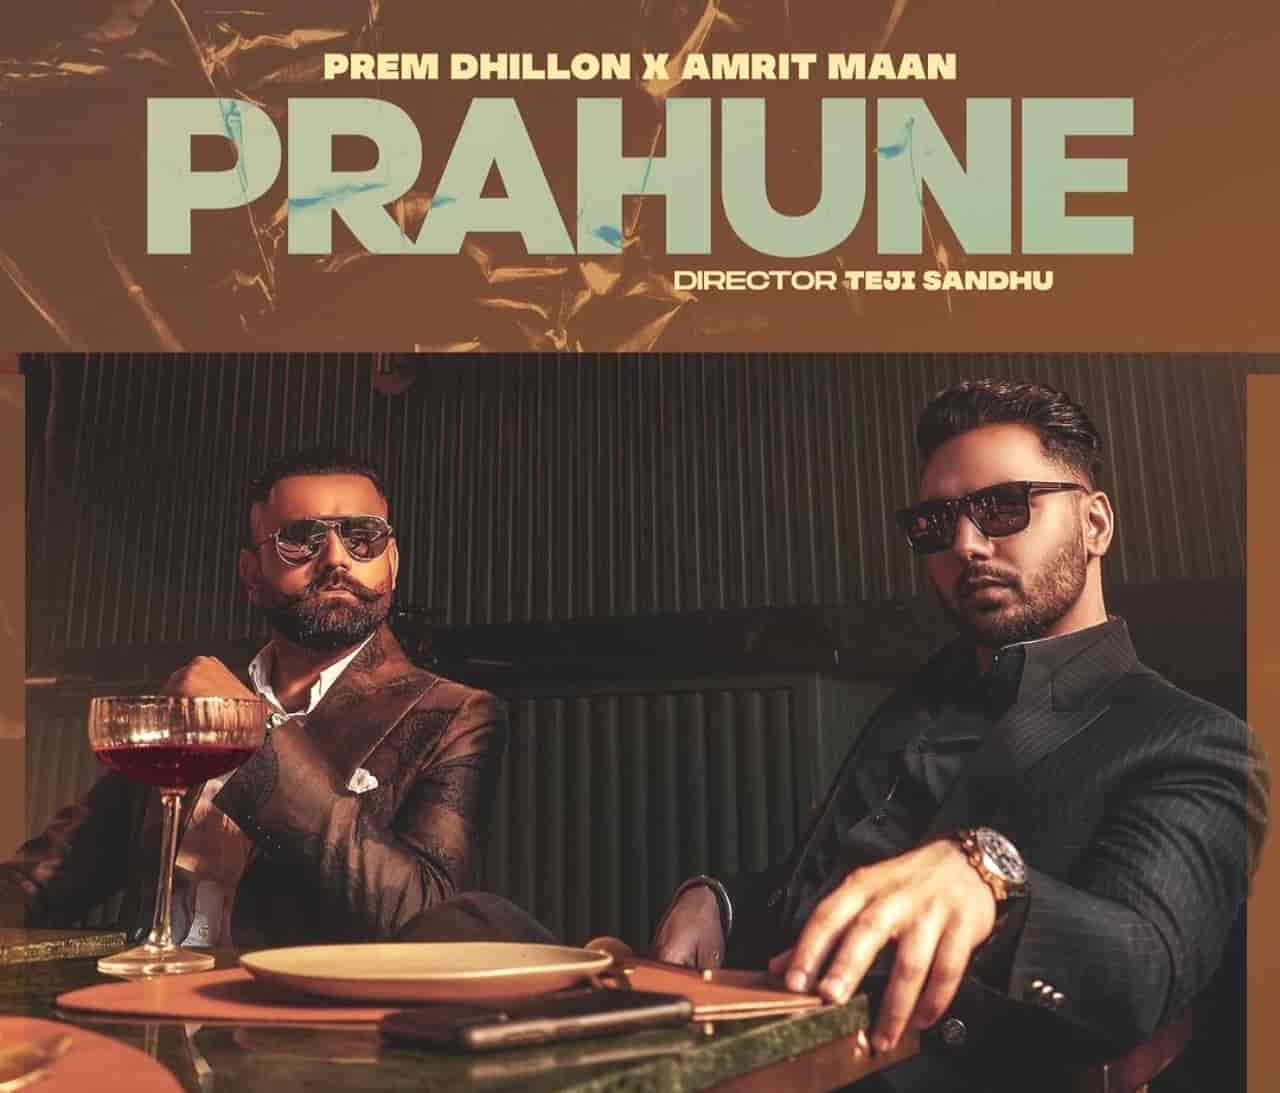 Prahune Punjabi Song Lyrics Prem Dhillon